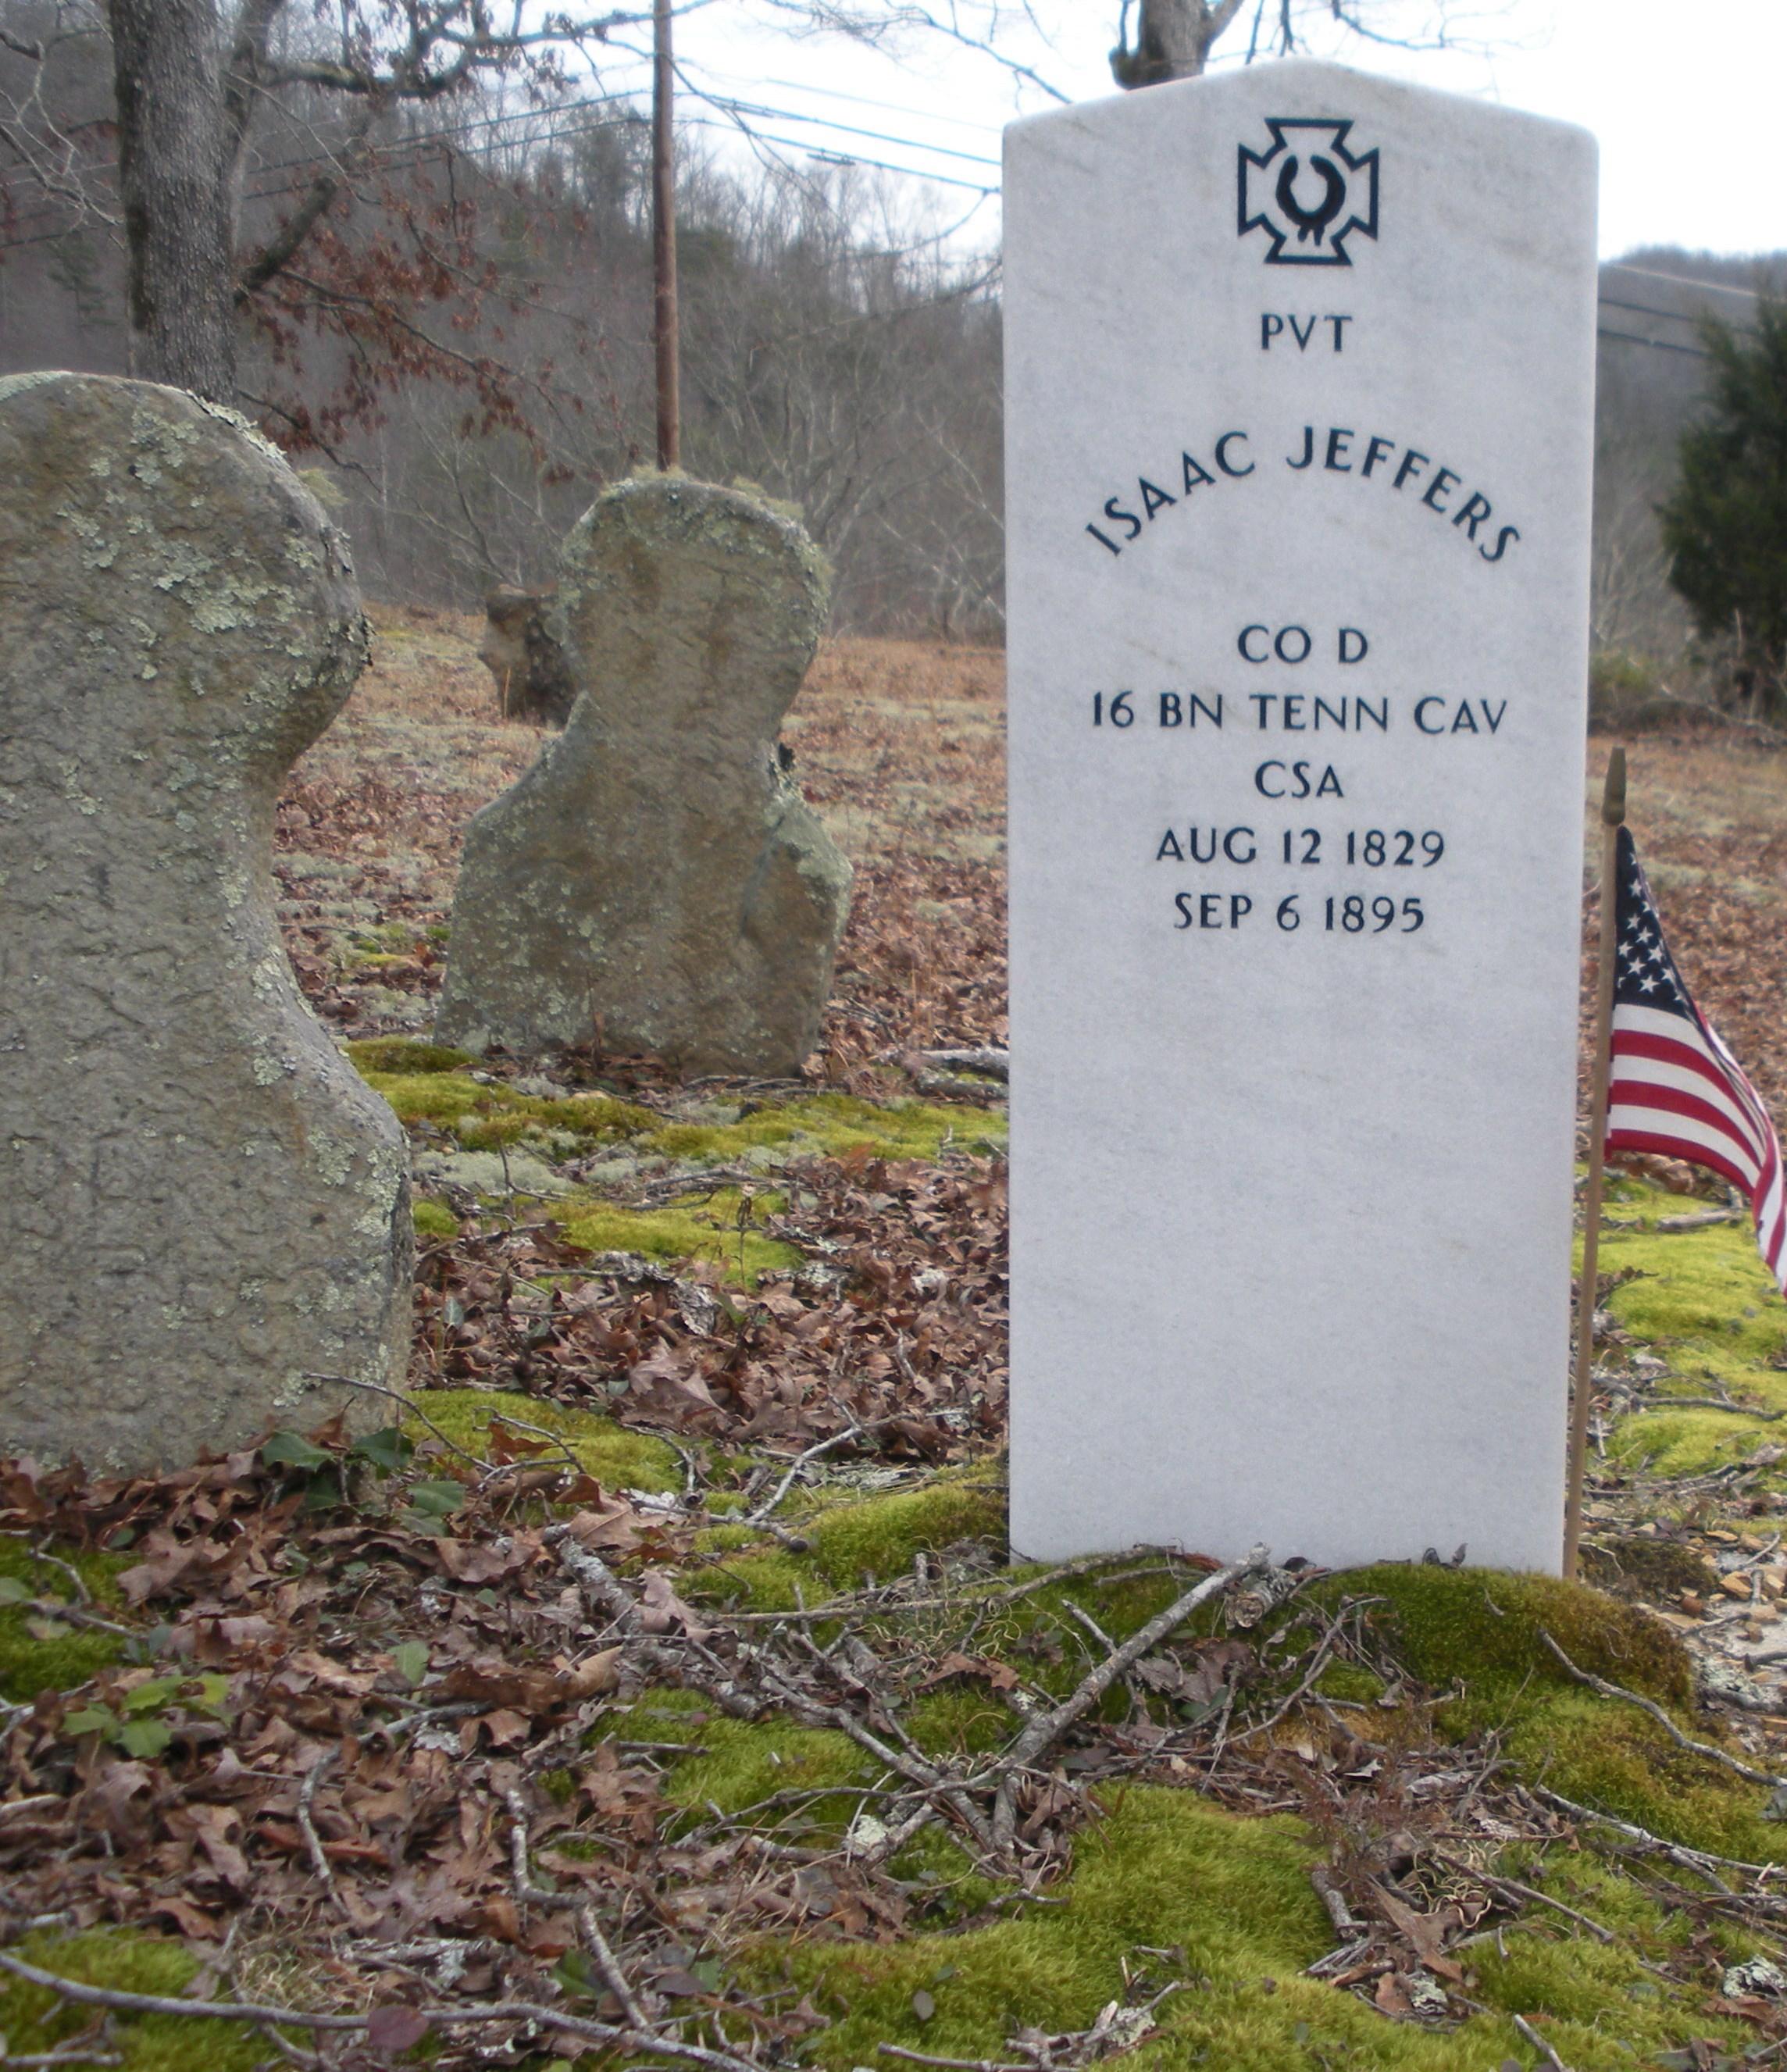 Isaac Jeffers